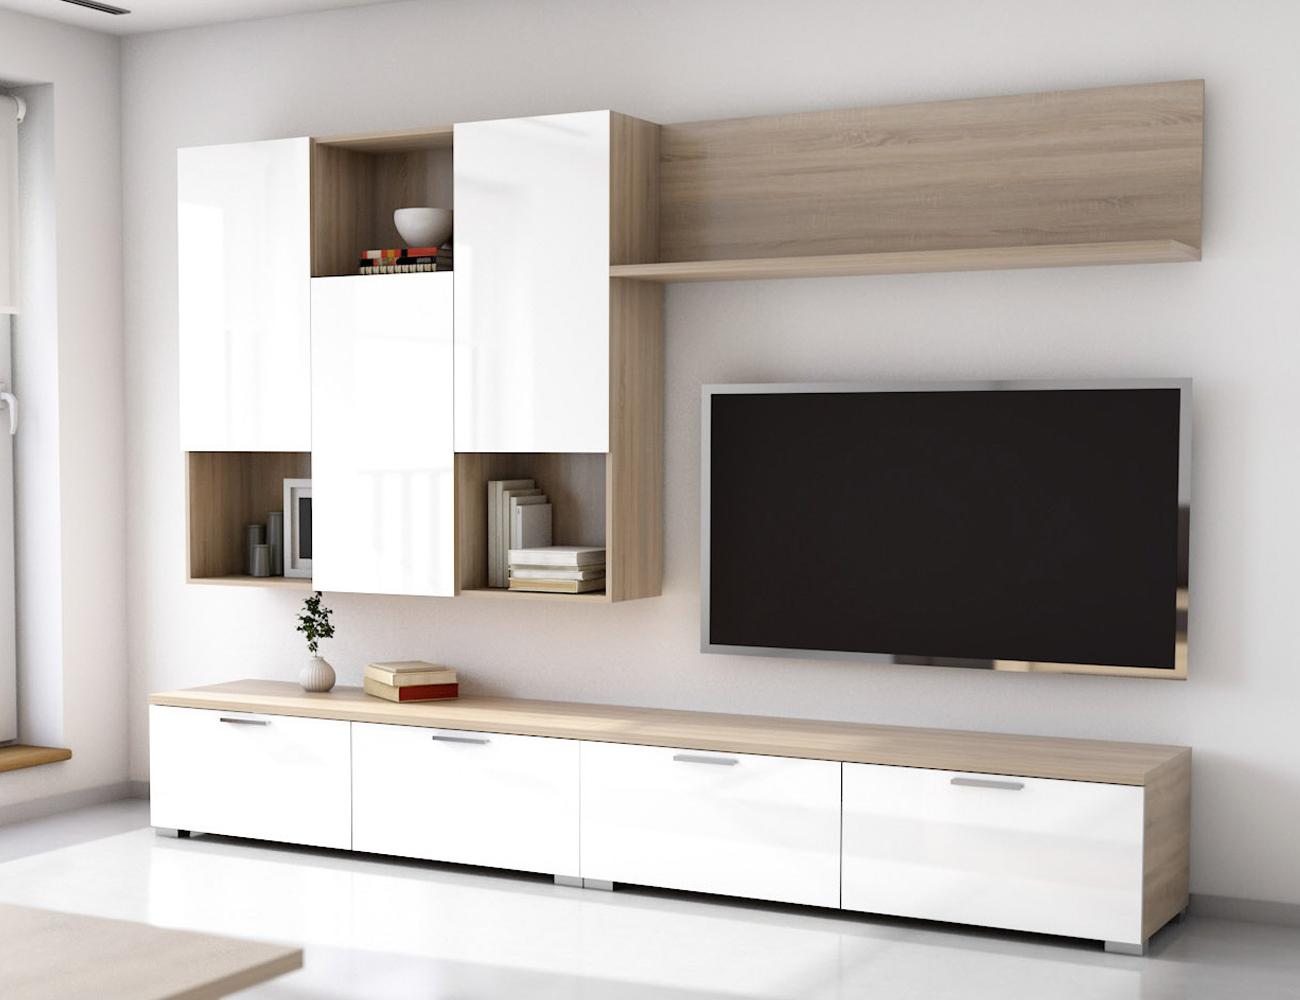 Muebles Blanco Zwd9 Mueble De Salà N Edor Estilo Moderno Roble Con Blanco 4280